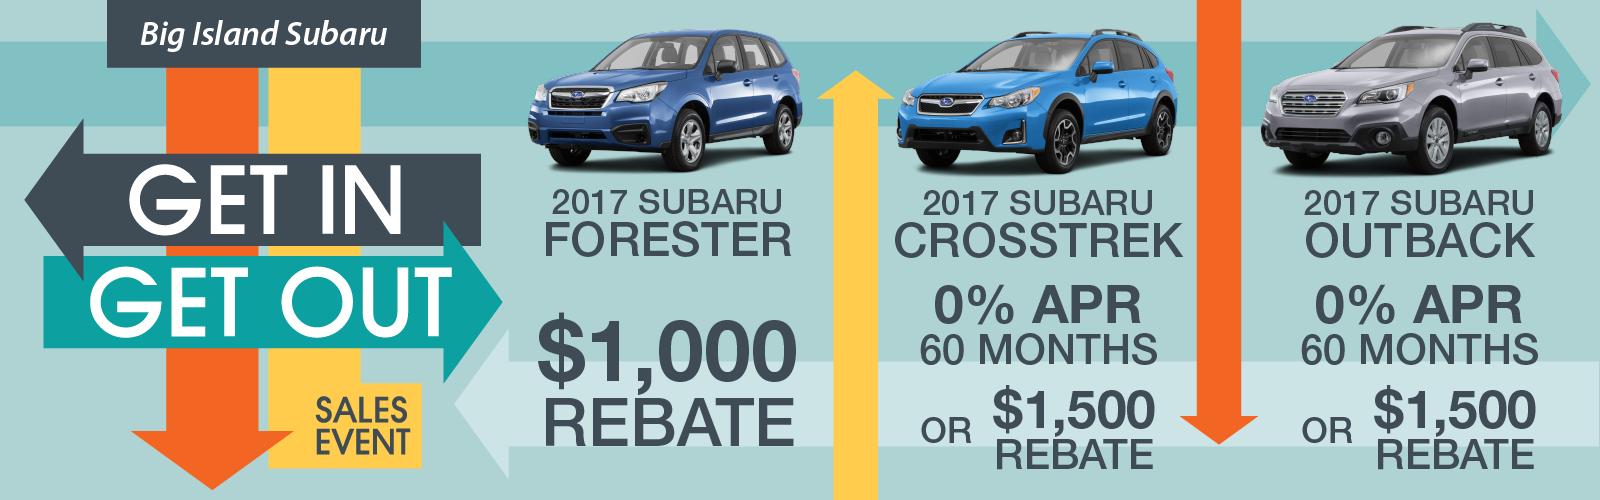 Subaru Get In Get Out Sale